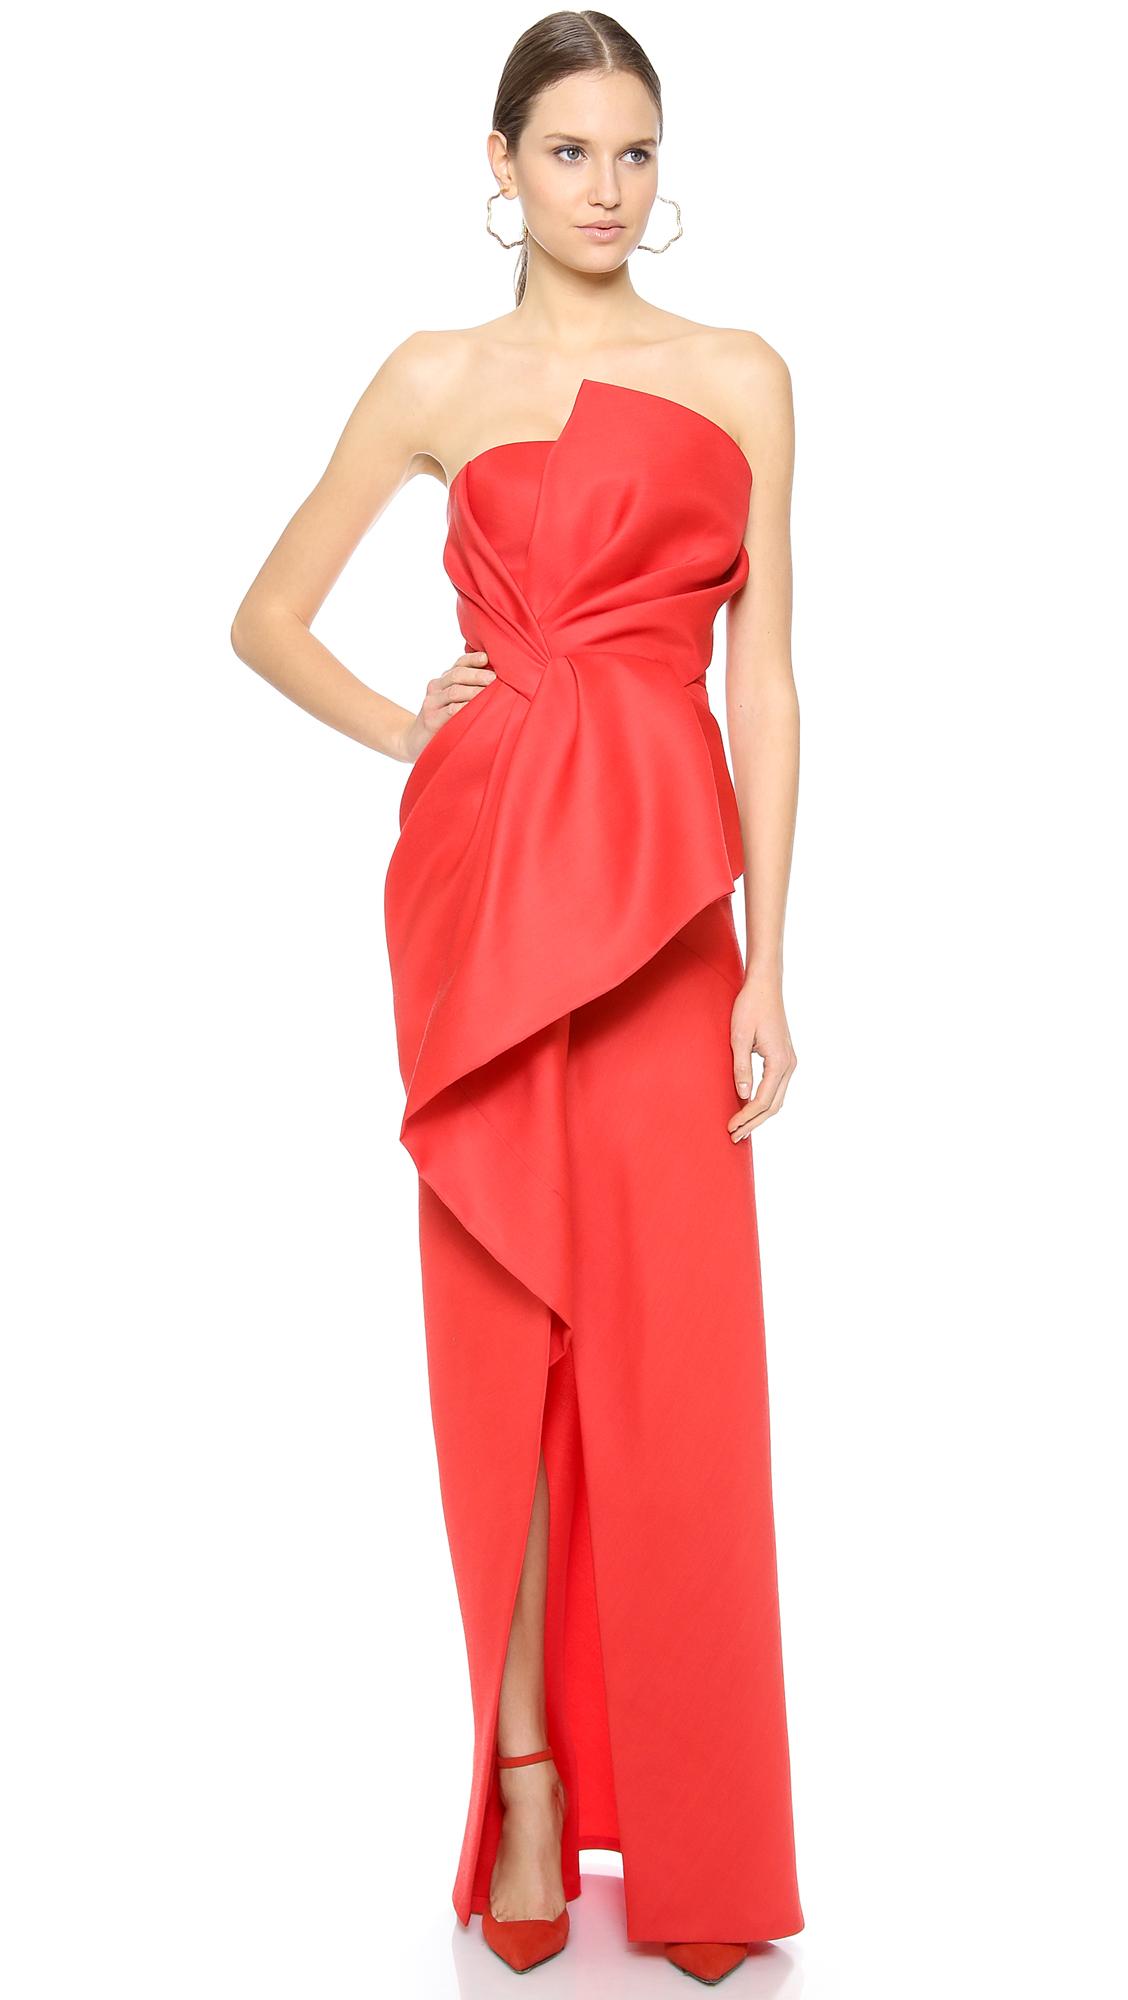 J. Mendel Strapless Asymmetrical Peplum Gown in Red - Lyst